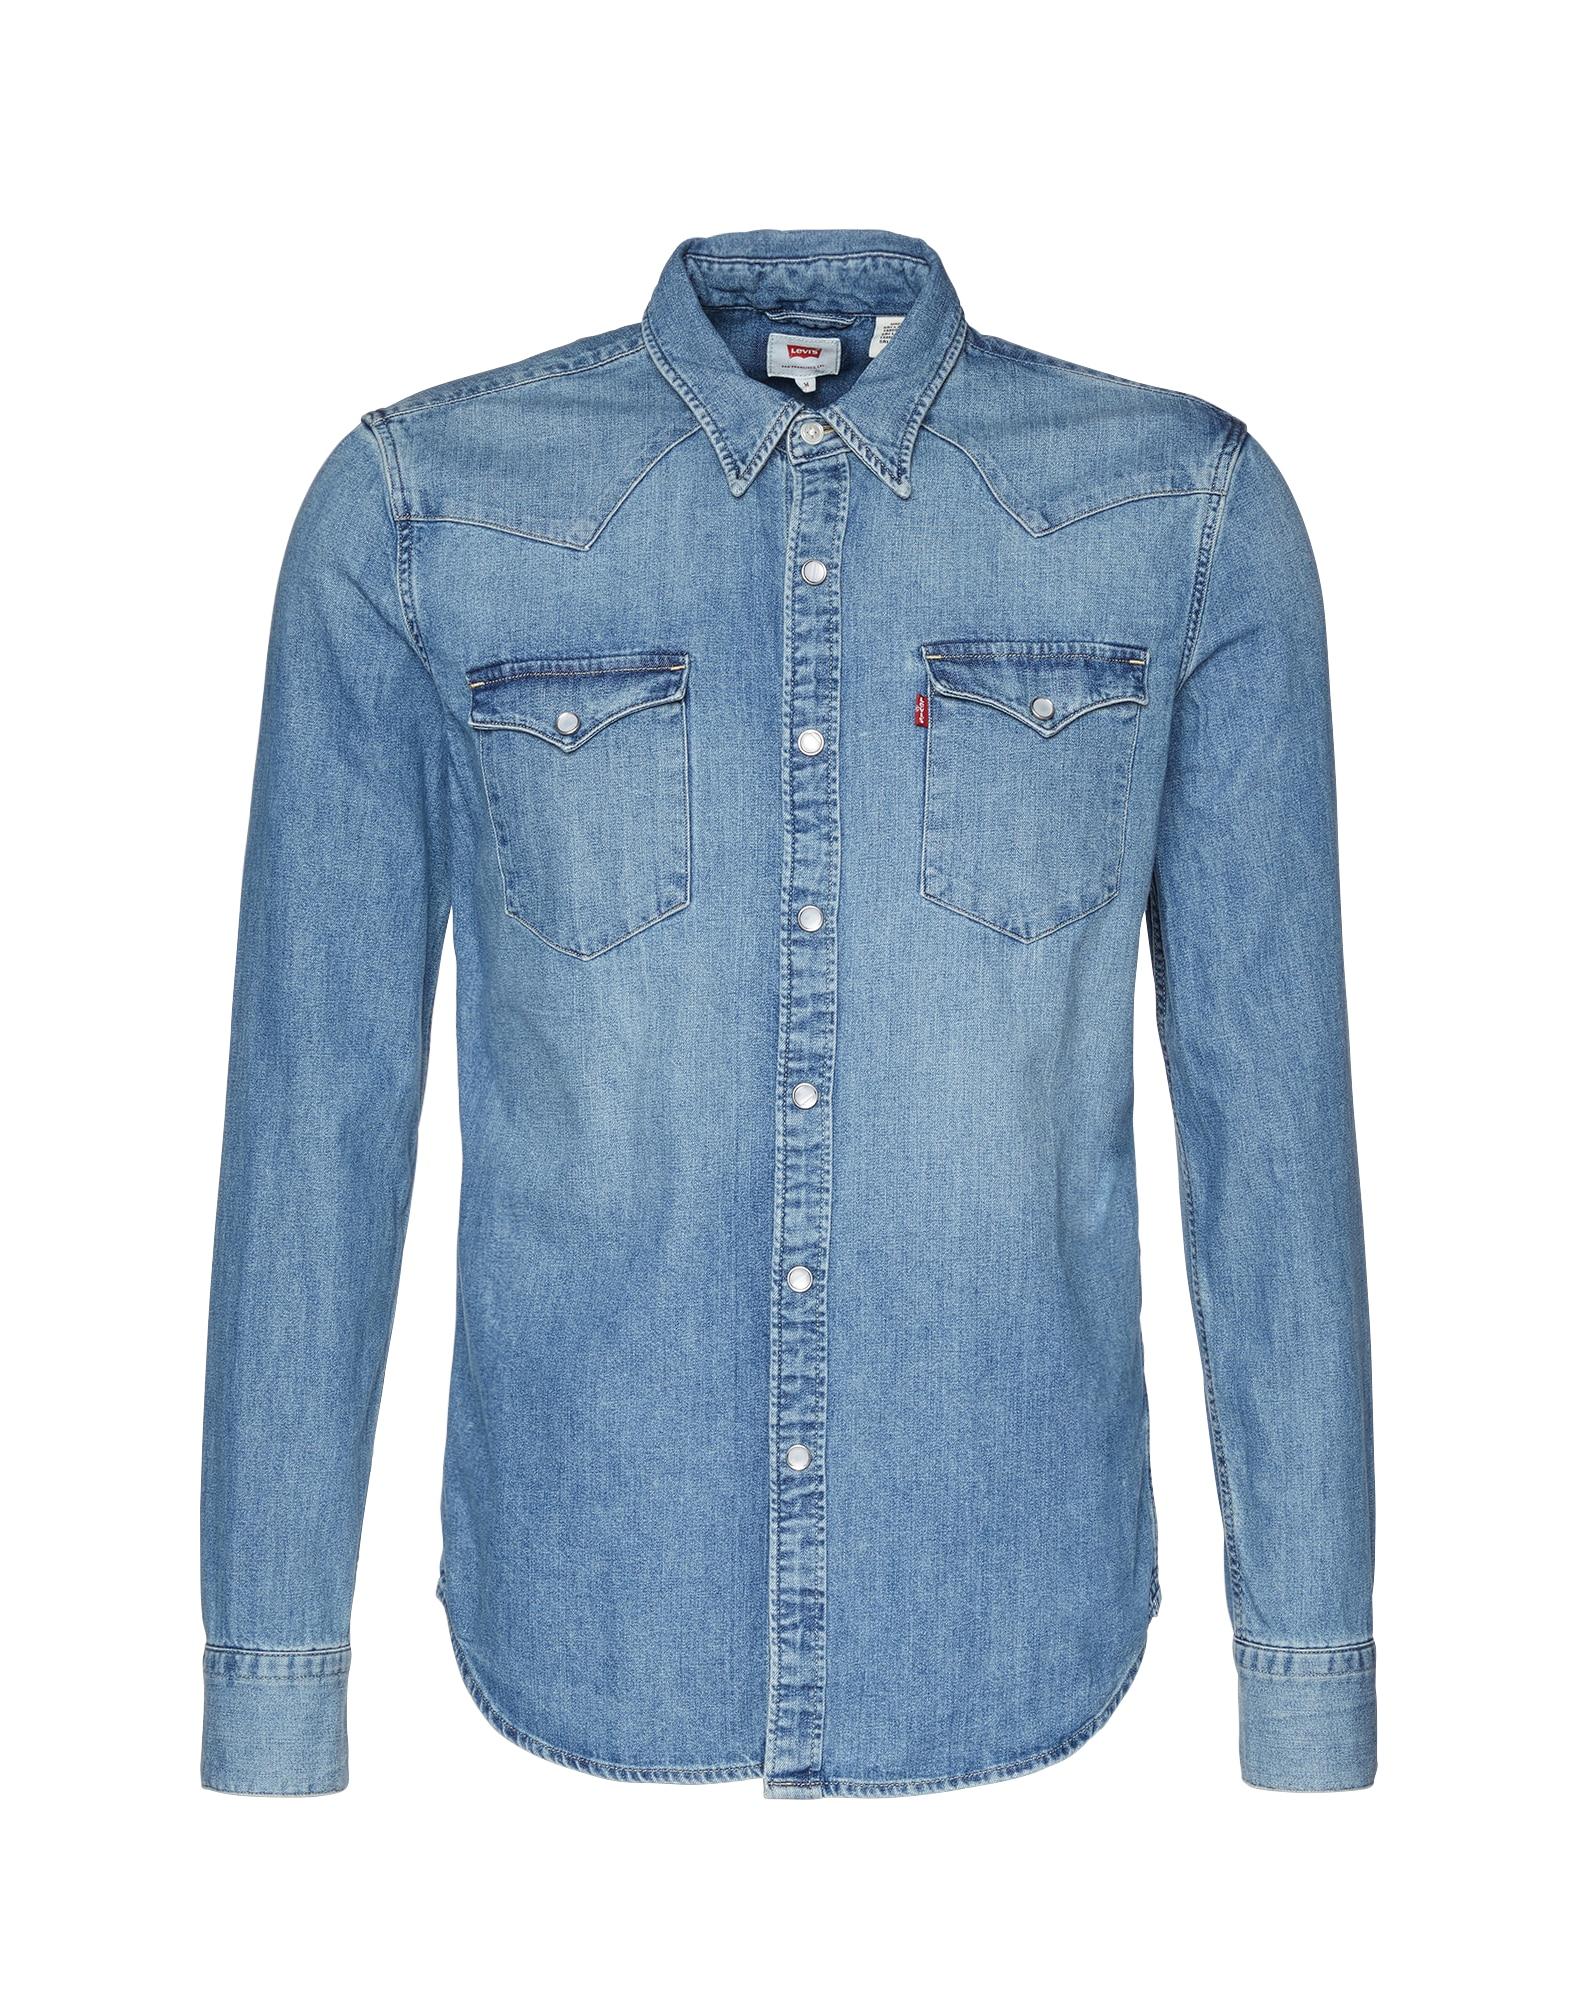 LEVI'S Heren Overhemd Barstow Western blauw